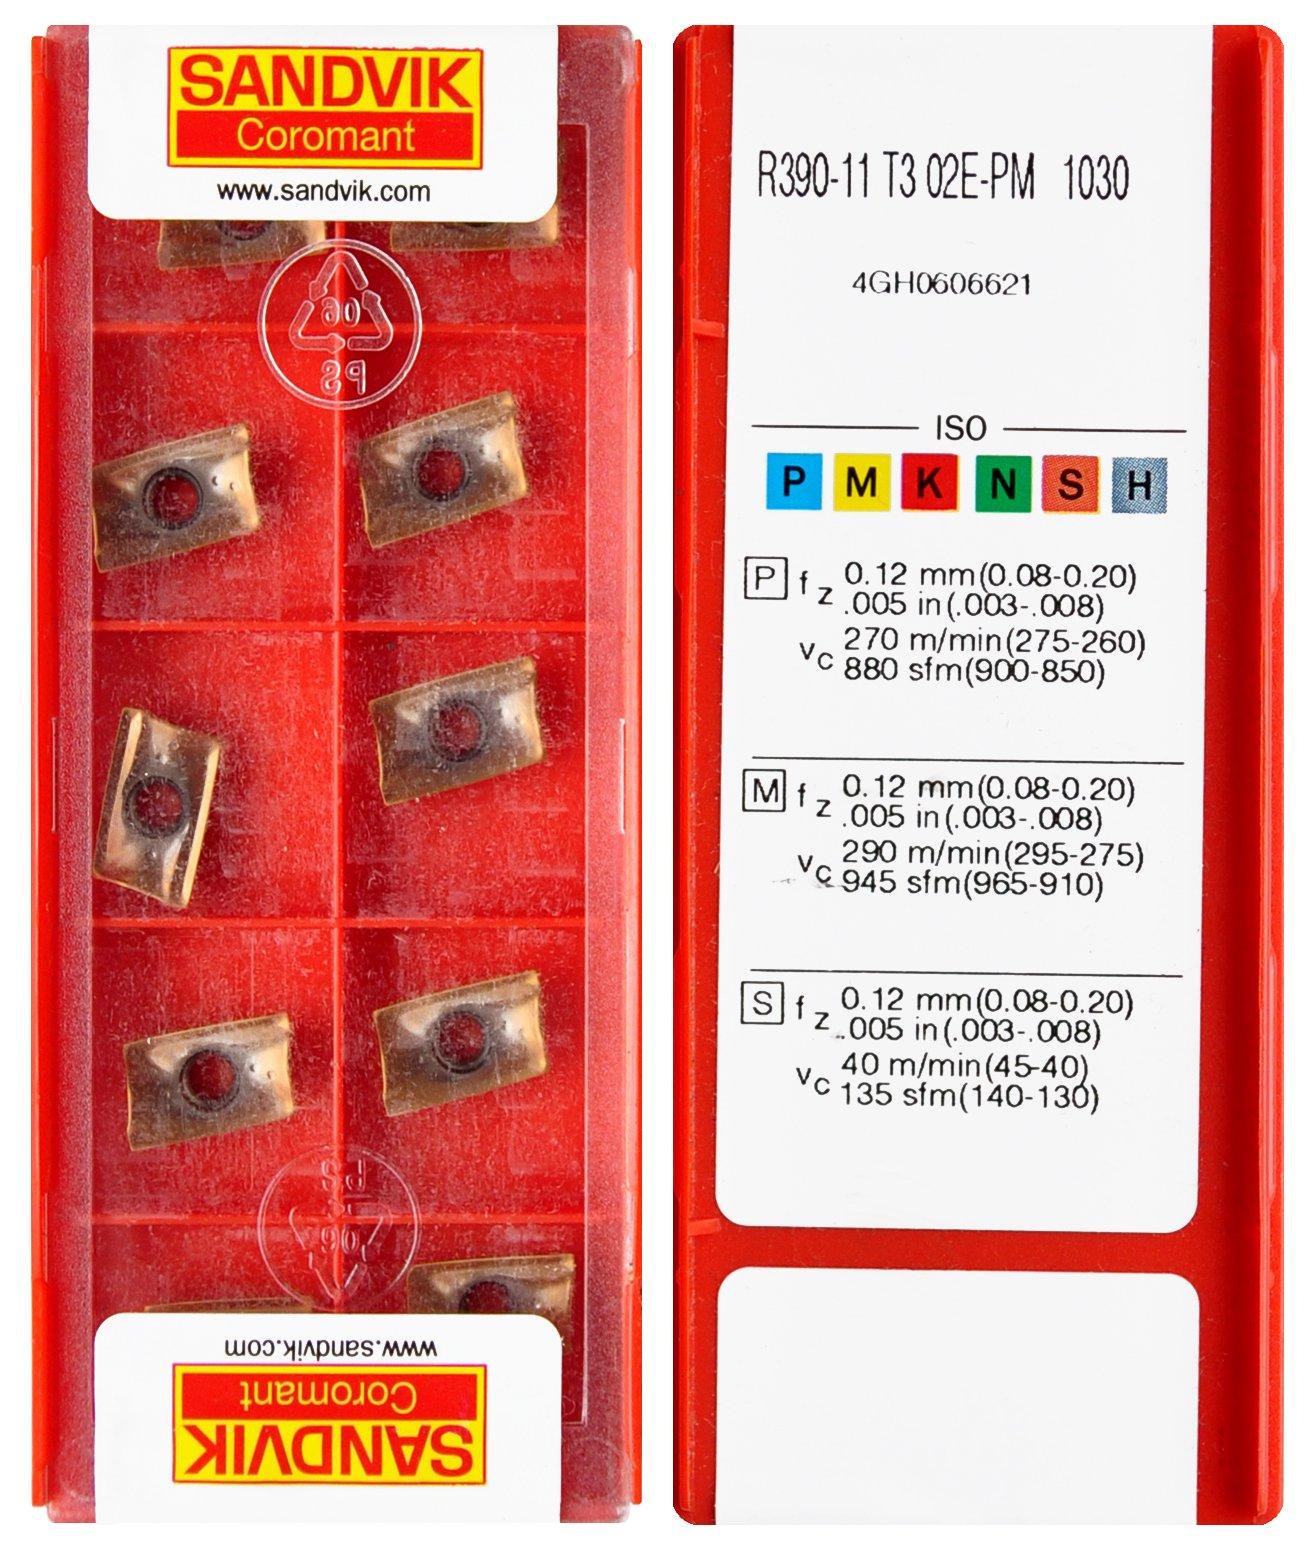 Dlaždice R390 11T302 E-PM 1030 SANDVIK * FV *